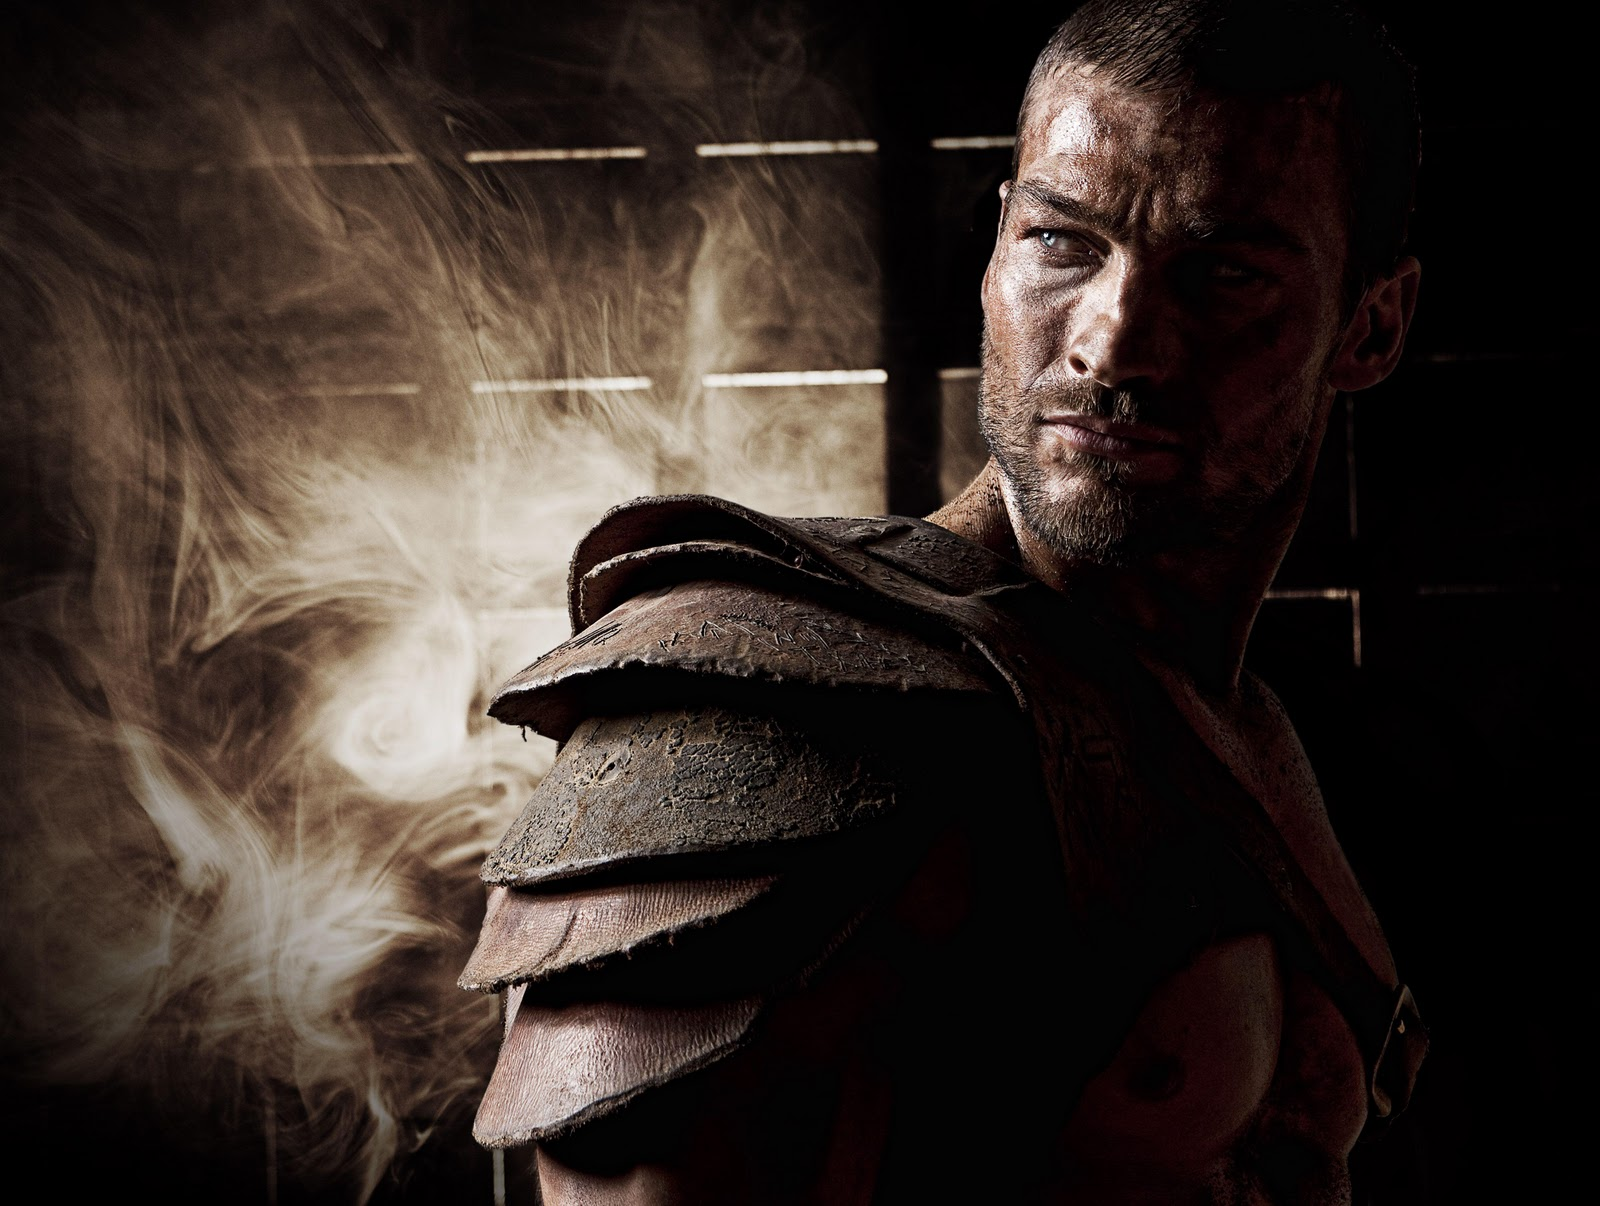 http://4.bp.blogspot.com/_iDp08JDjAjM/TR0GpBCrcQI/AAAAAAAAFWE/WiBbAdQVZGI/s1600/la-exitosa-serie-ldquospartacus-blood-and-sandrdquo-regresa-a-la-pantalla-de-moviecity-1.jpg